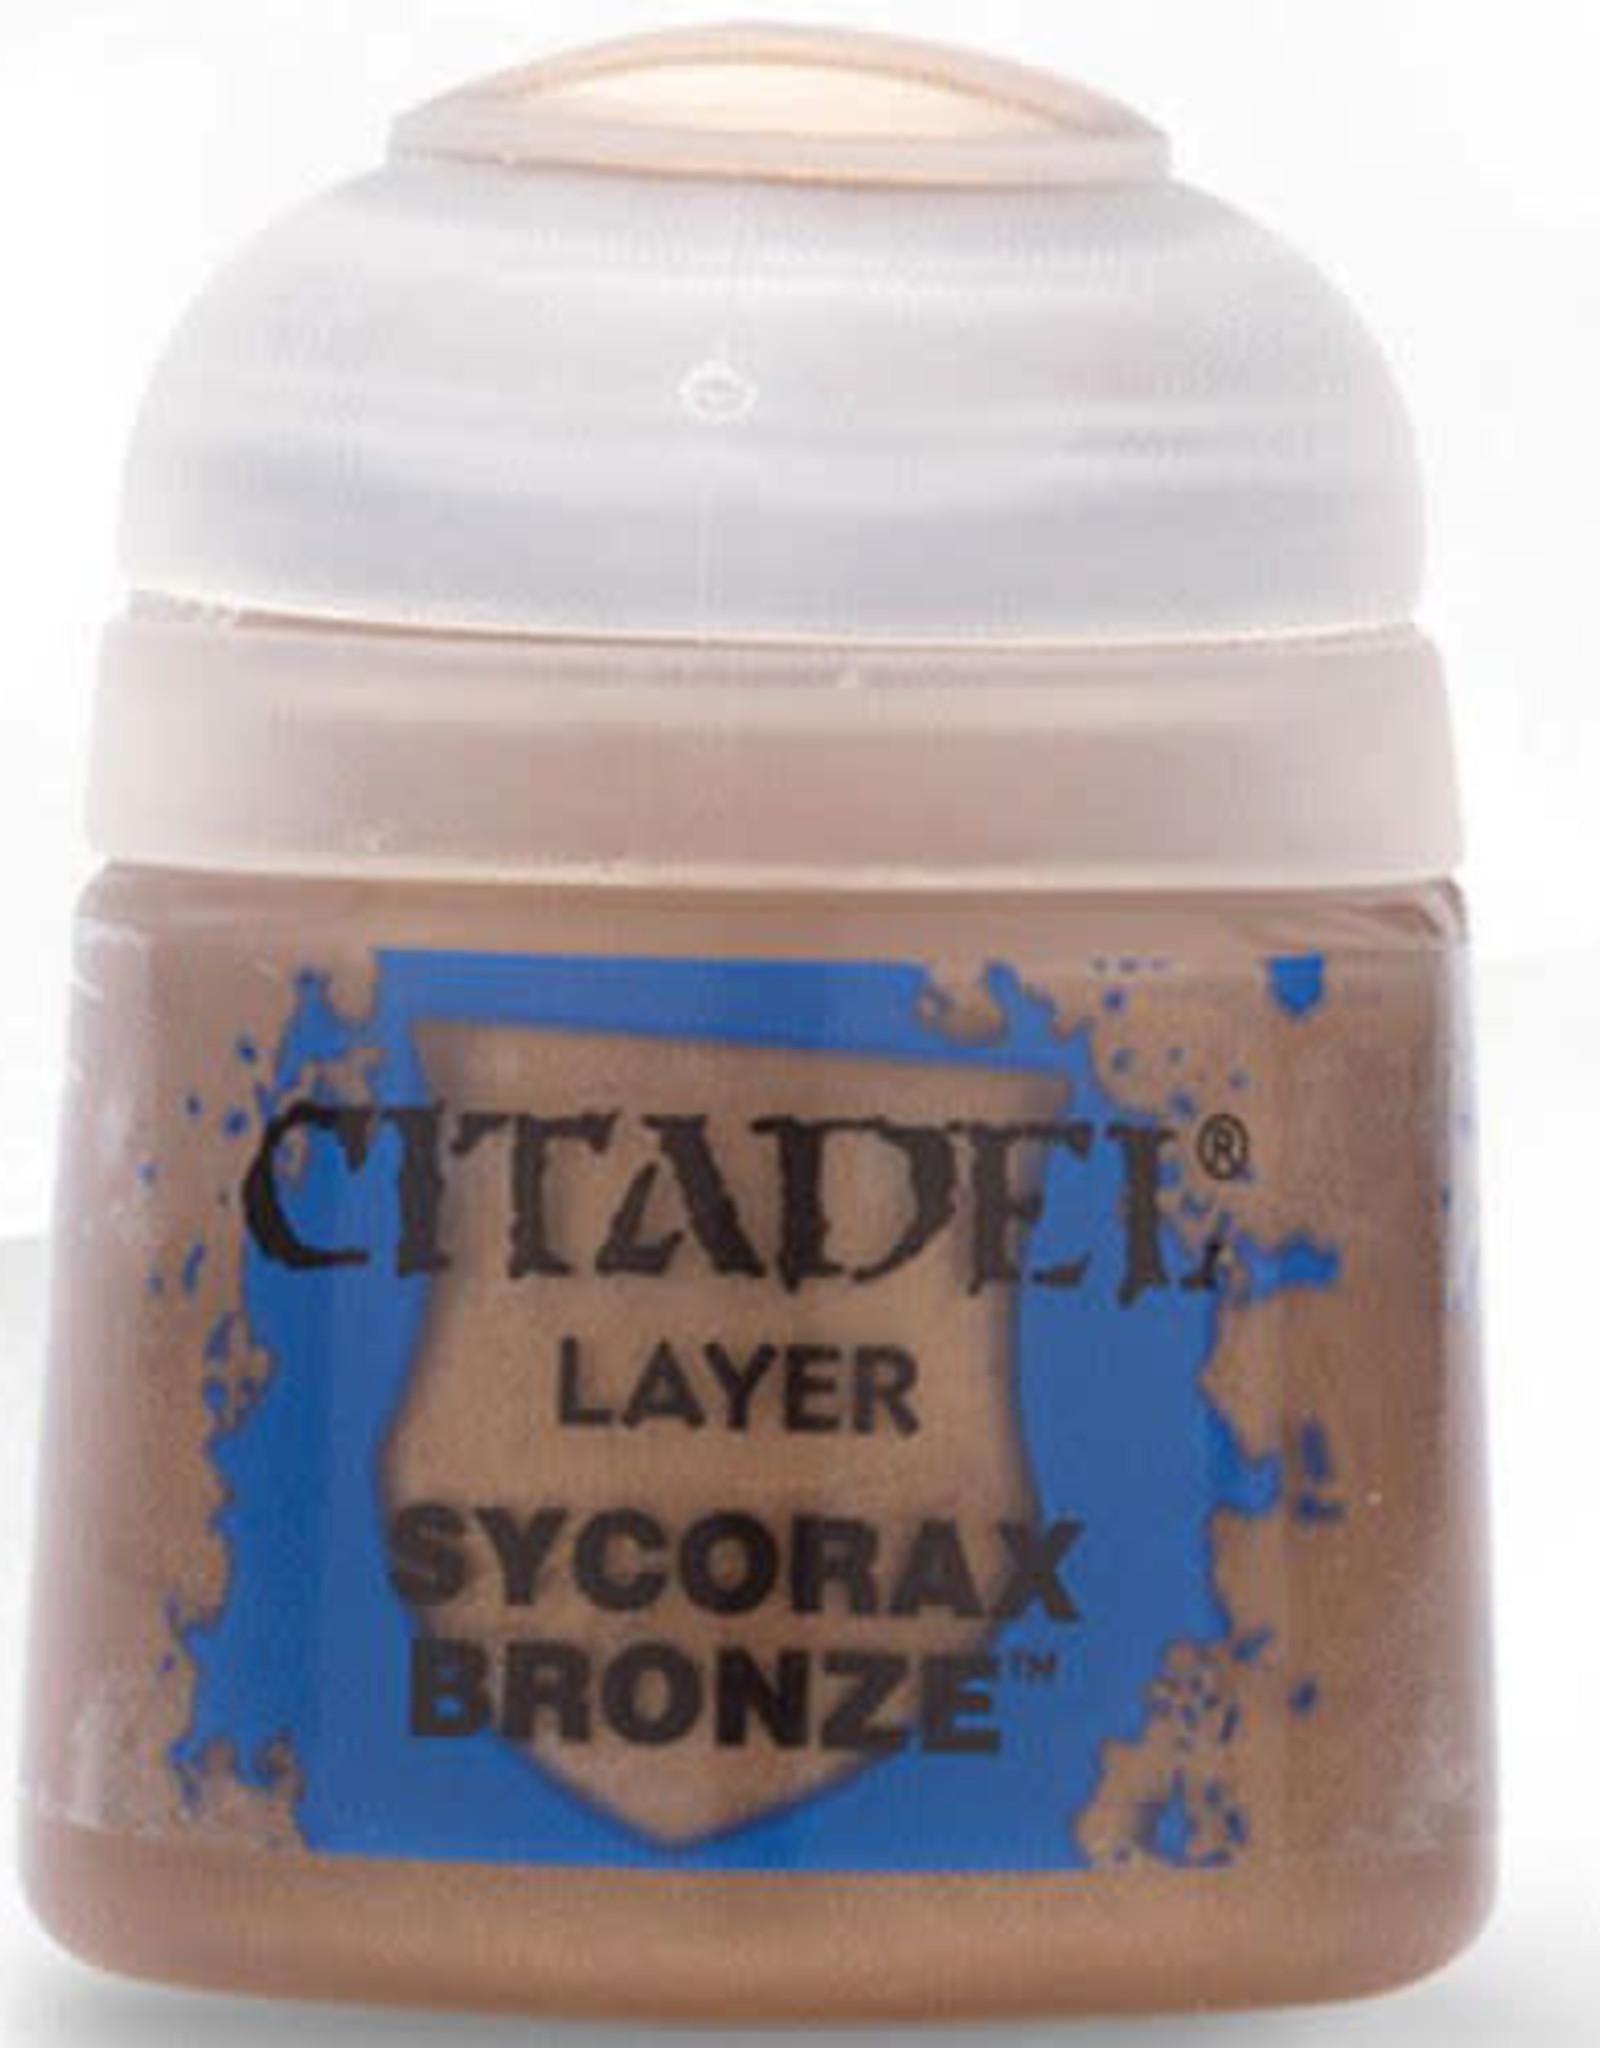 Citadel Layer Paint: Sycorax Bronze (12ml)